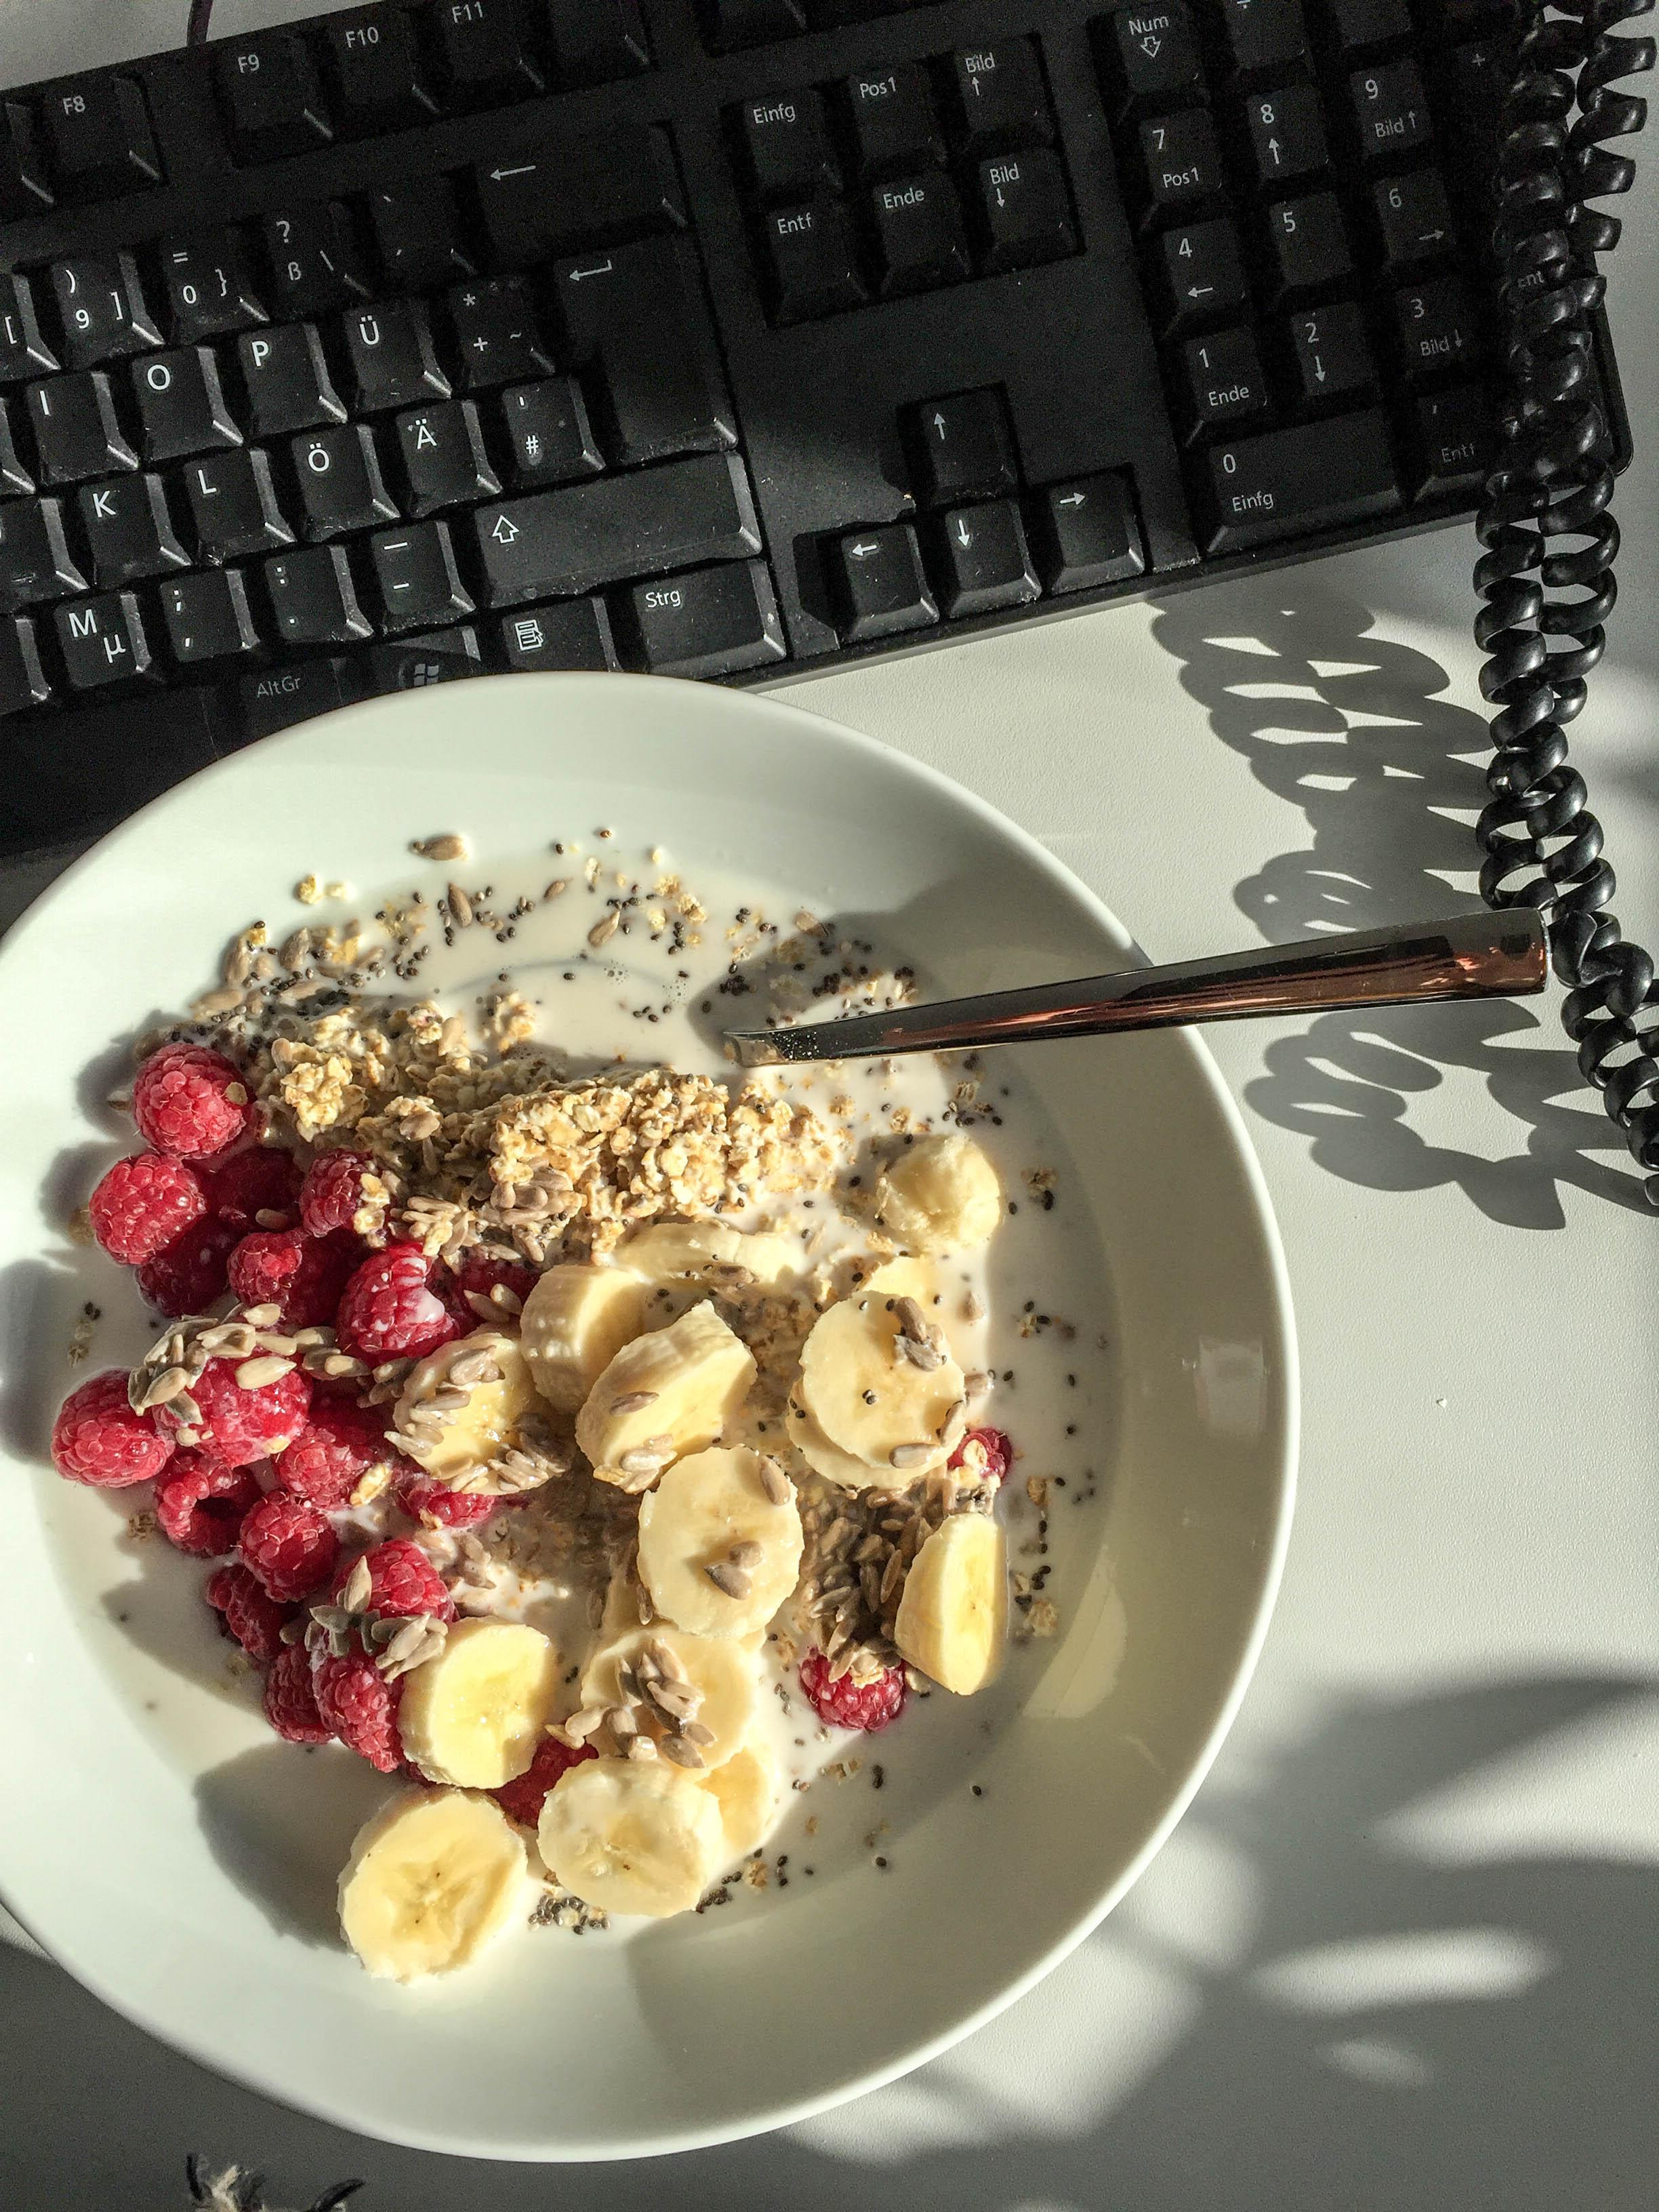 Frühstück im Büro